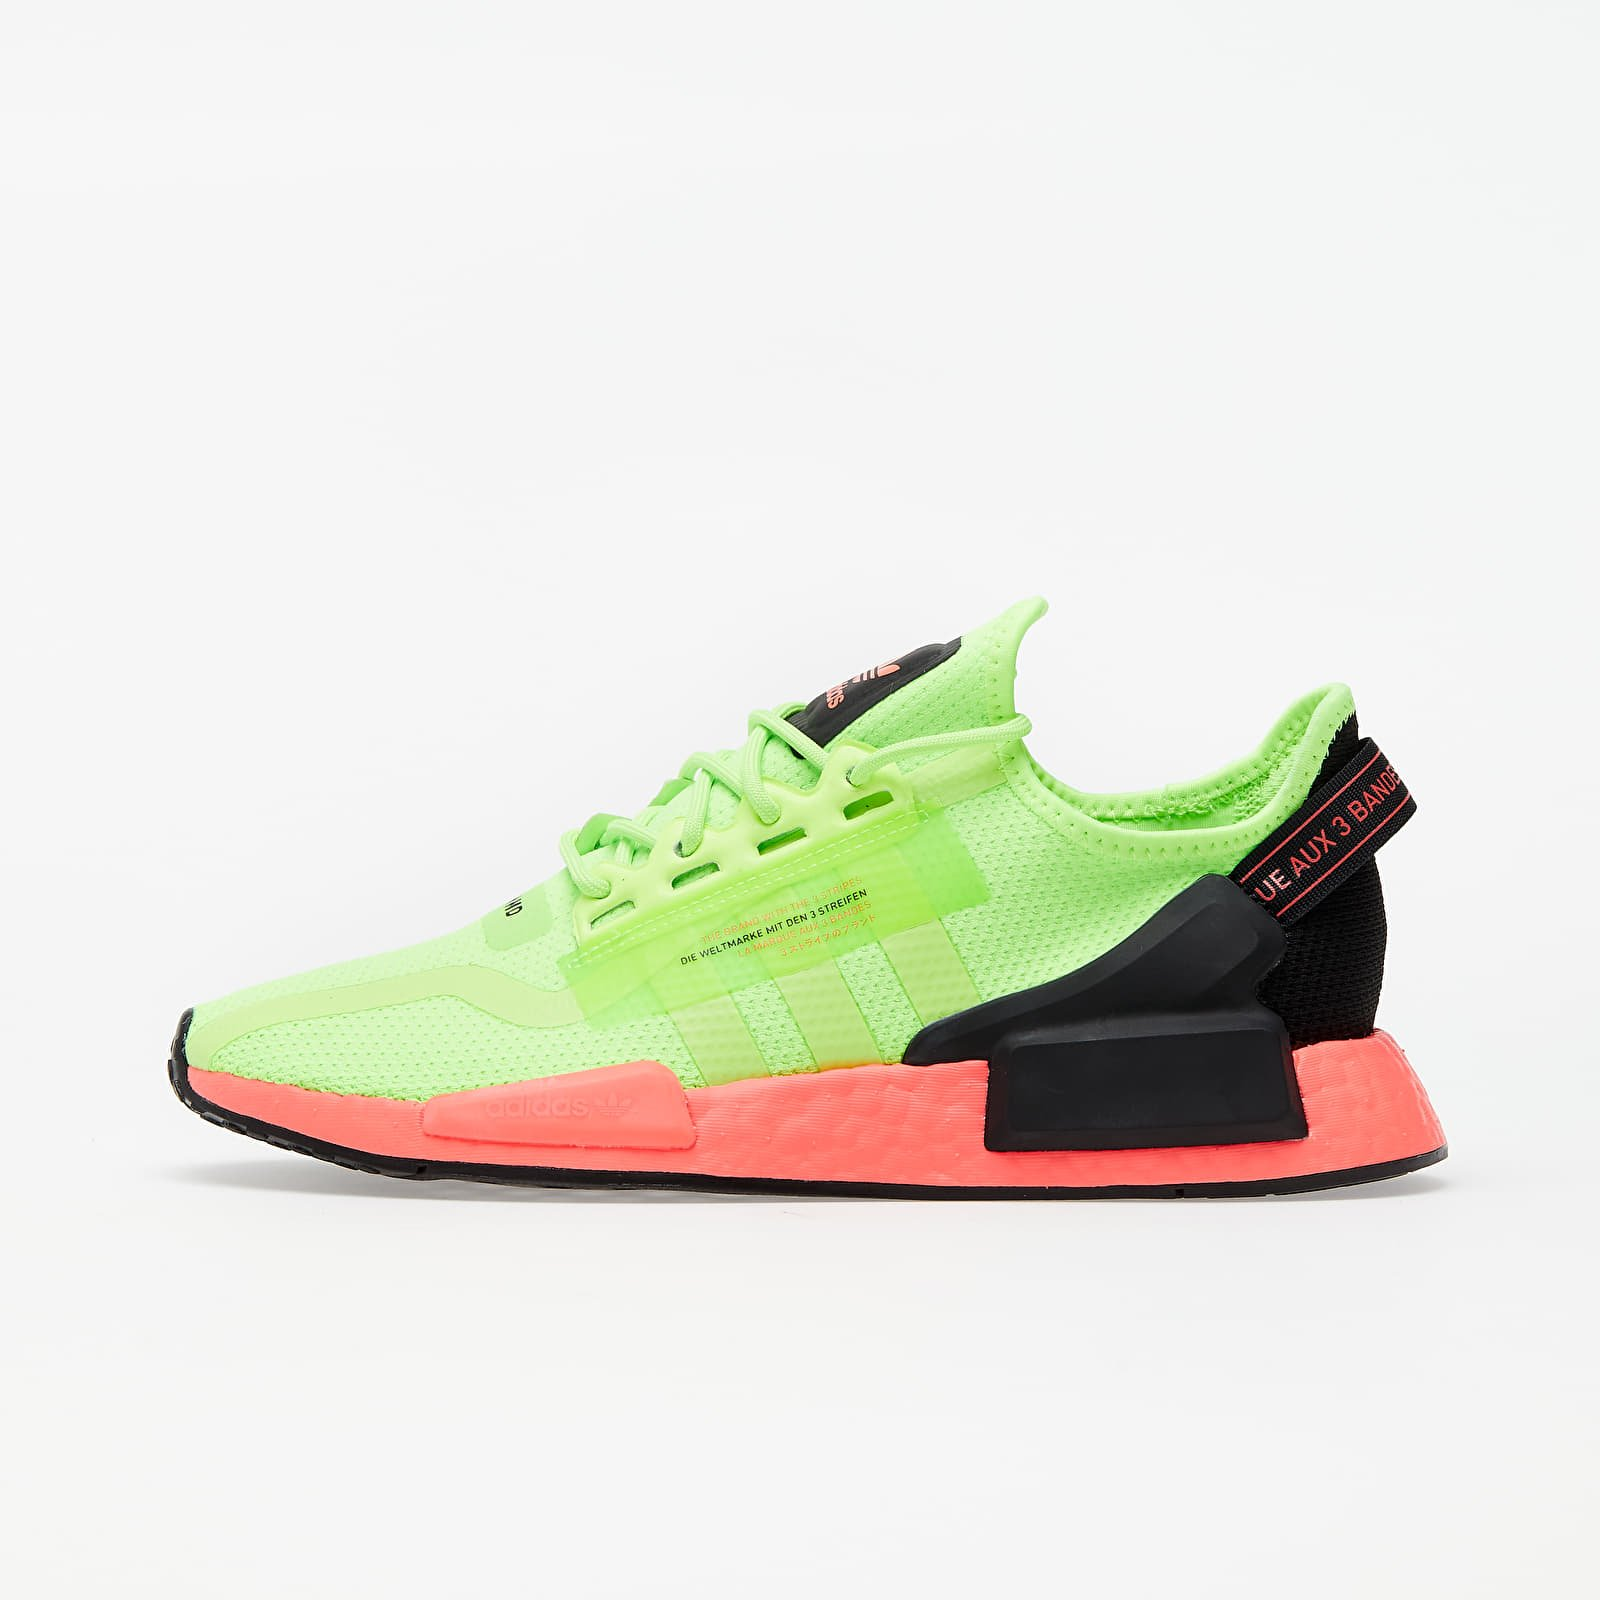 Мужская обувь adidas NMD_R1.V2 Signature Green/ Signature Green/ Signature Pink